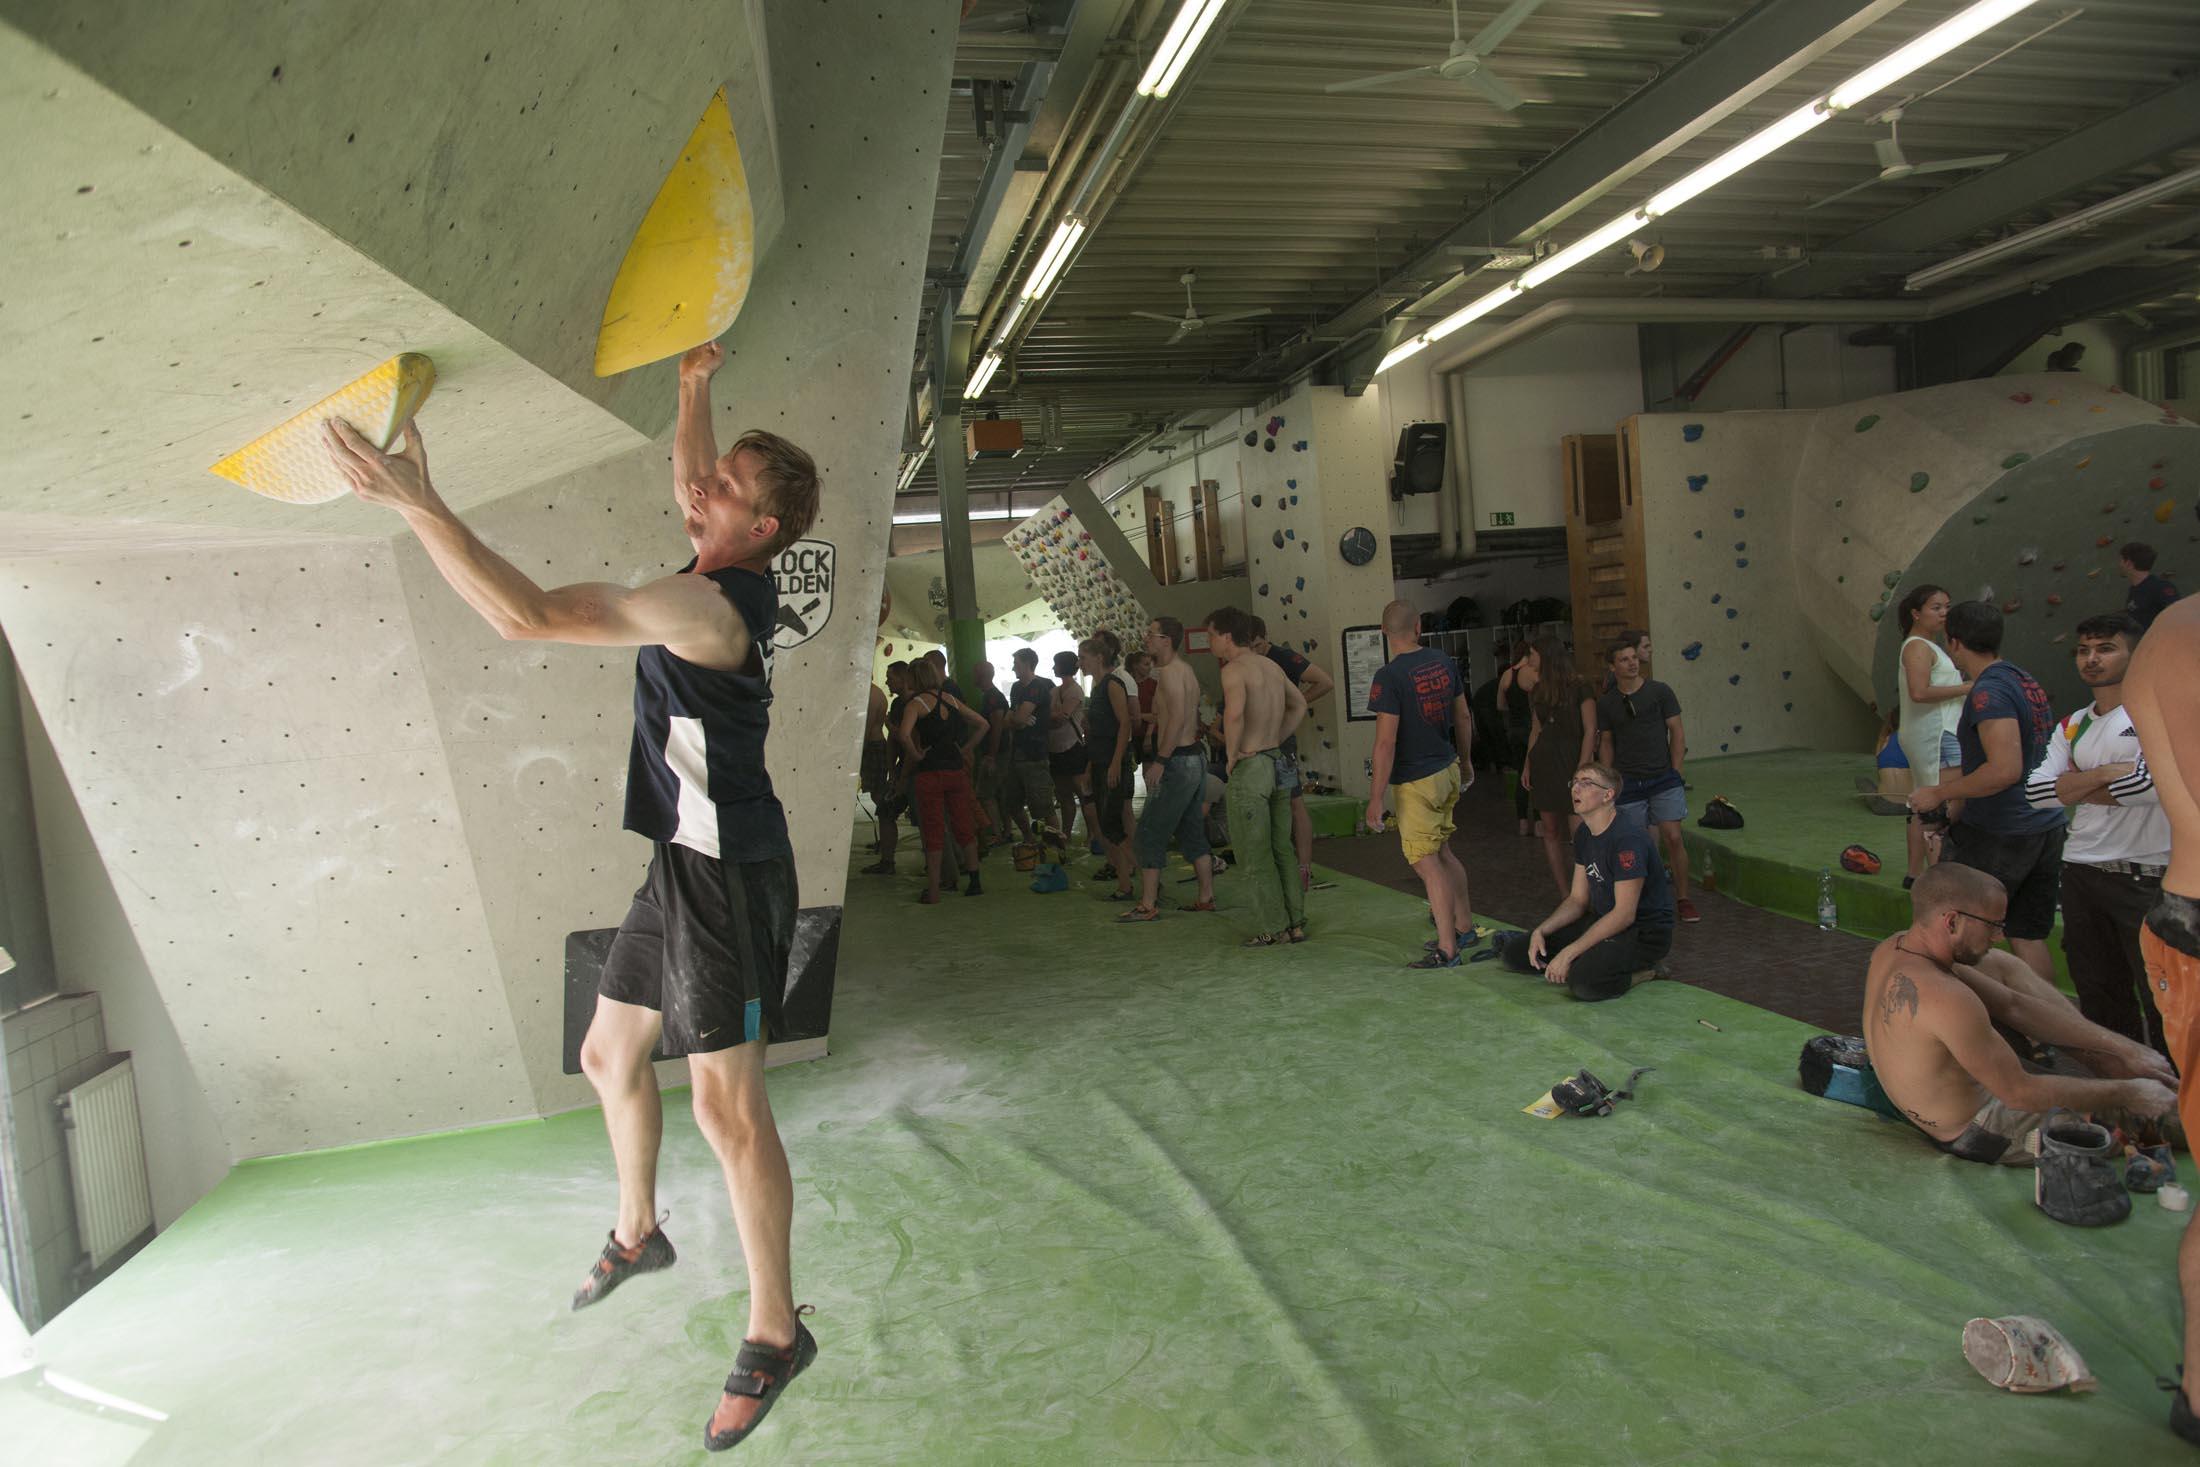 Quali, internationaler bouldercup Frankenjura 2016, BLOCKHELDEN Erlangen, Mammut, Bergfreunde.de, Boulderwettkampf07092016405